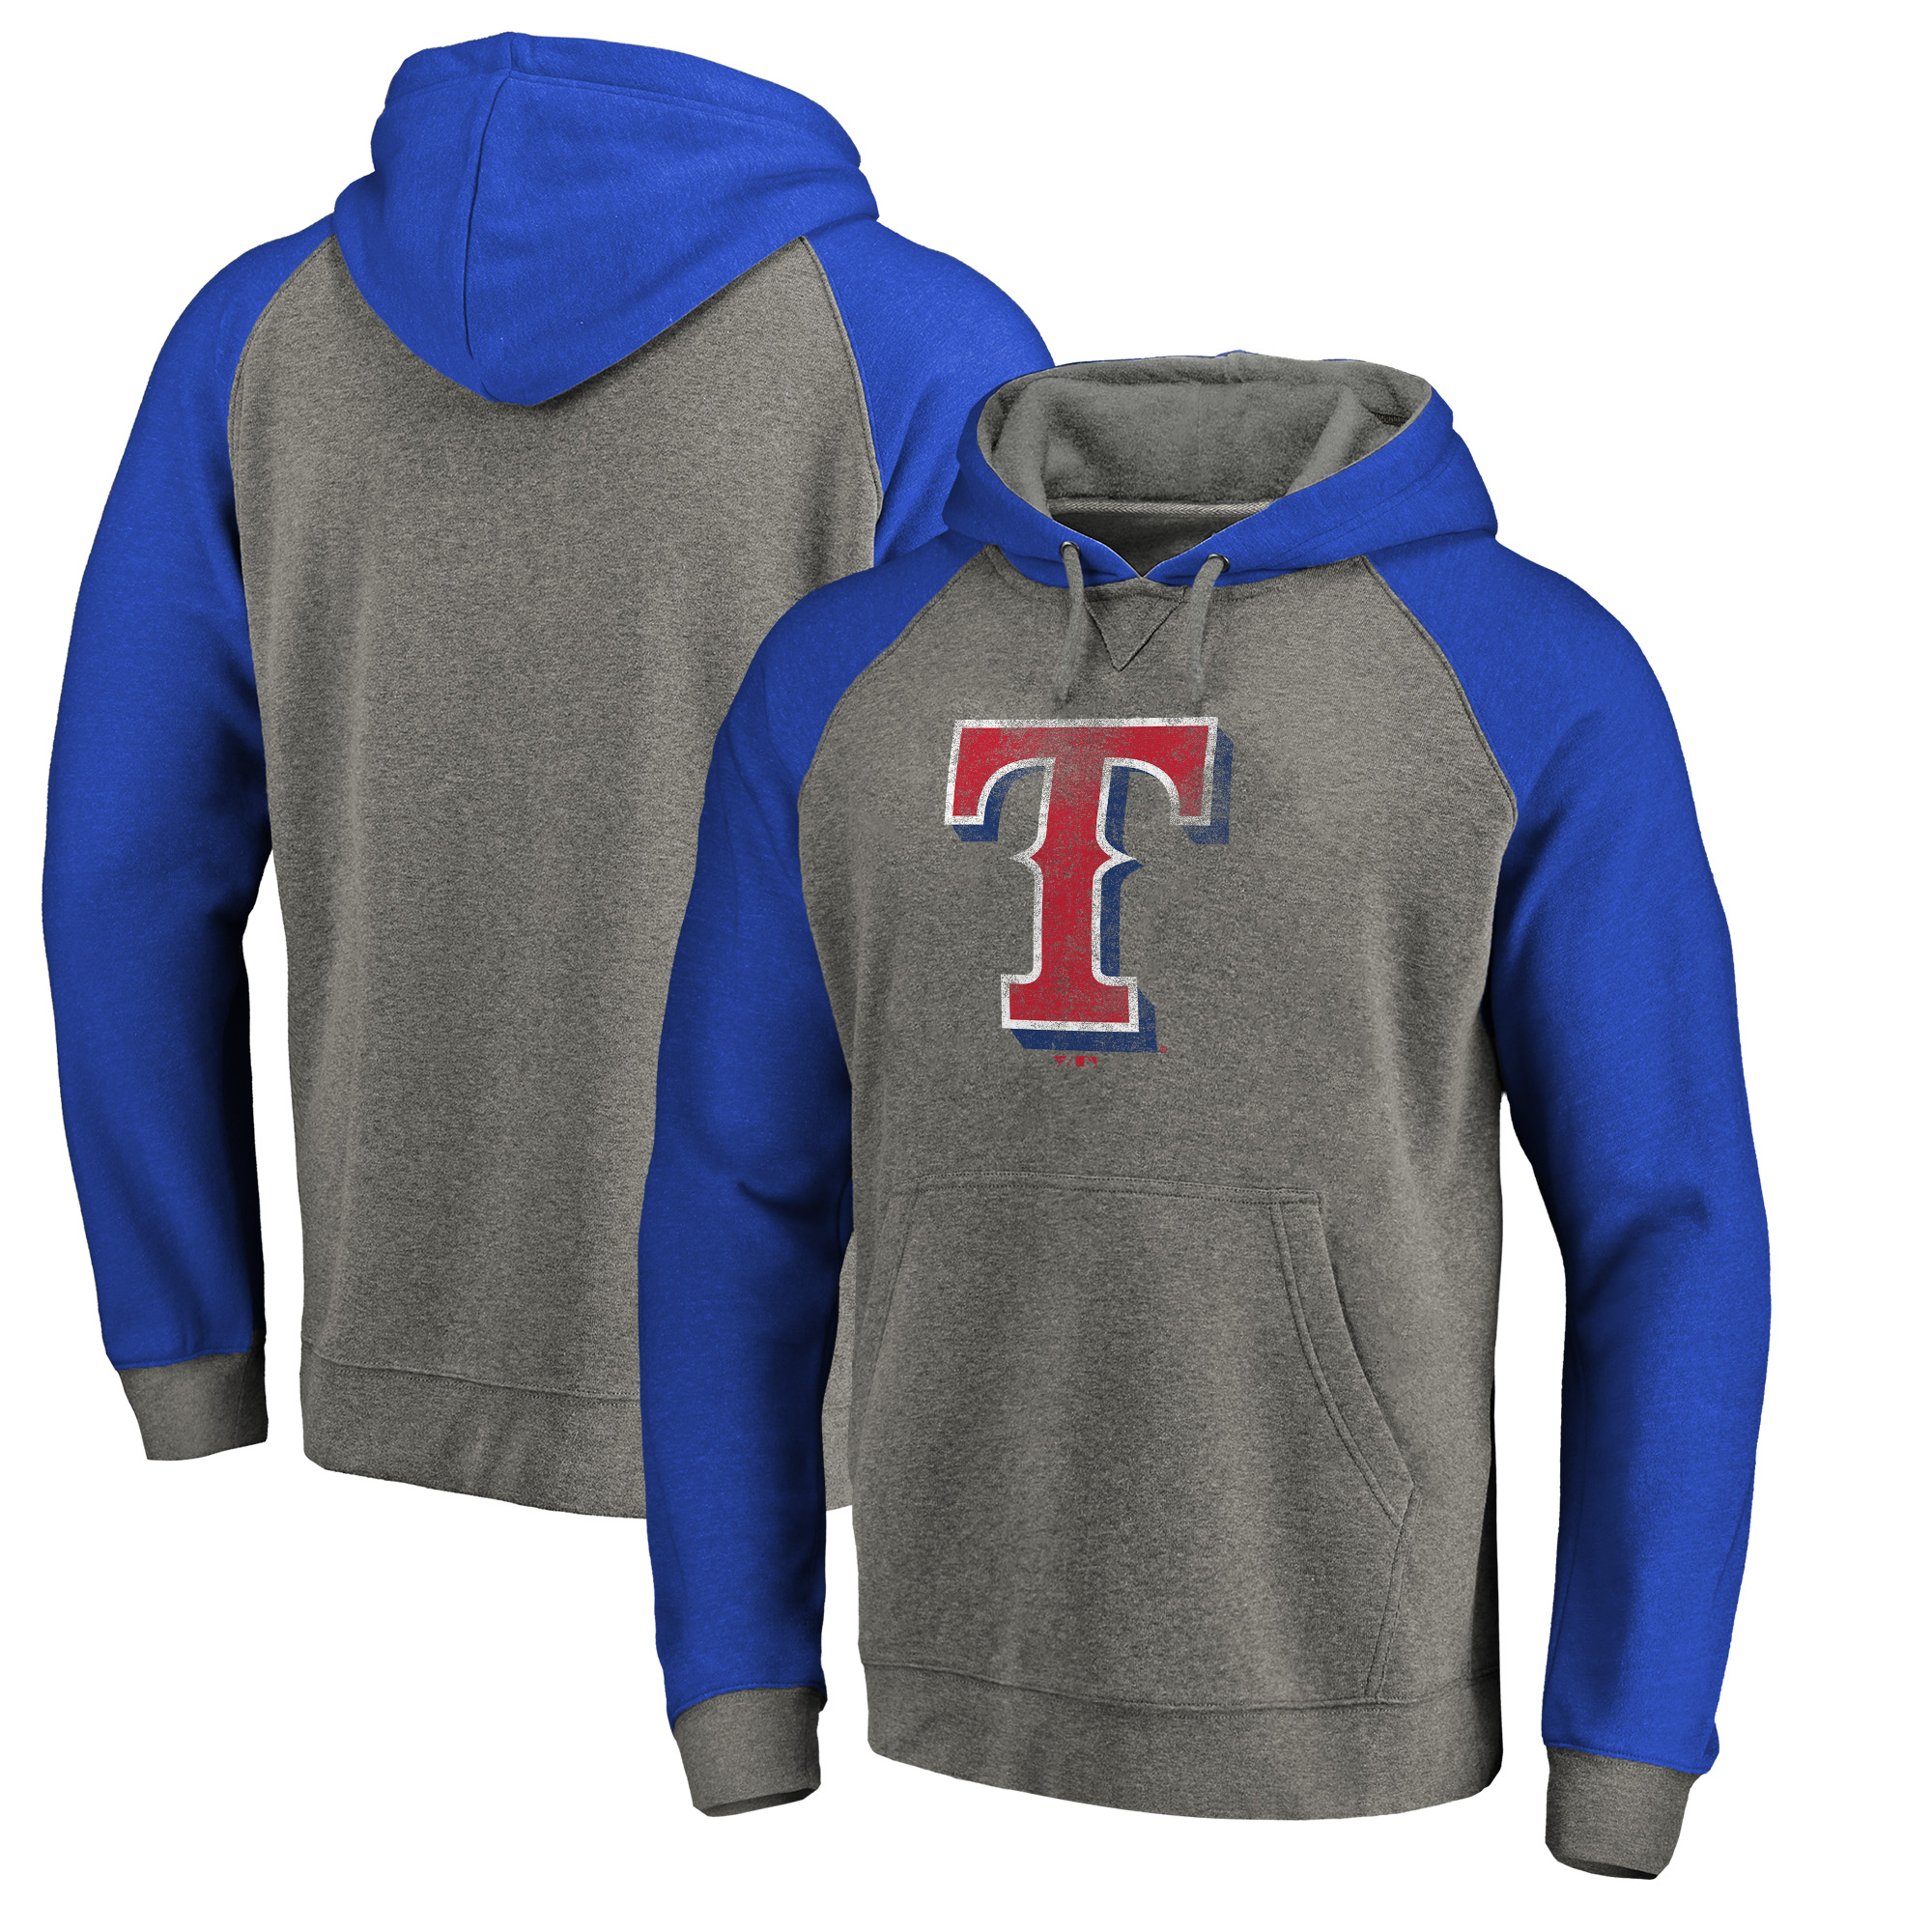 Texas Rangers Fanatics Branded Distressed Team Logo Tri-Blend Big & Tall Raglan Pullover Hoodie - Gray/Royal